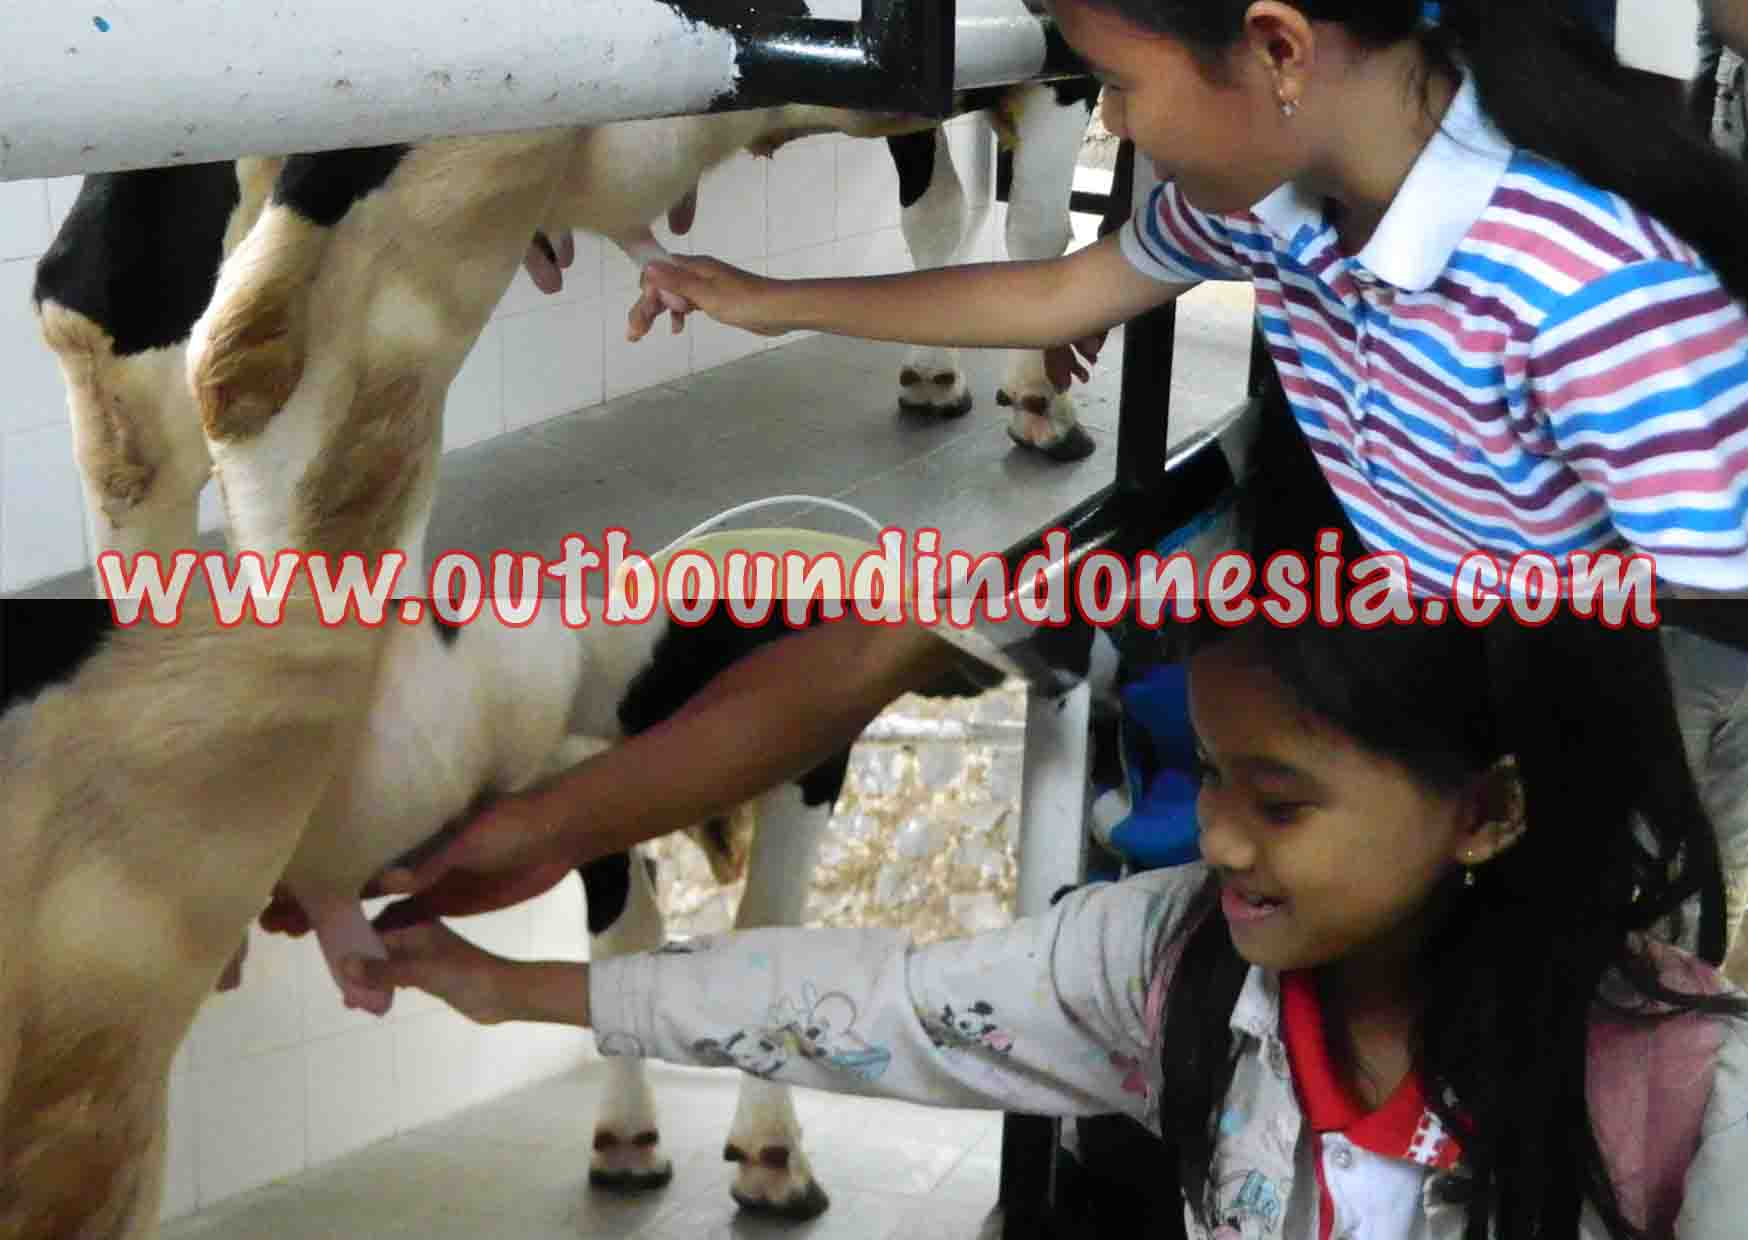 wisata edukasi bhakti alam pasuruan, www.outboundindonesia.com, 085755059965